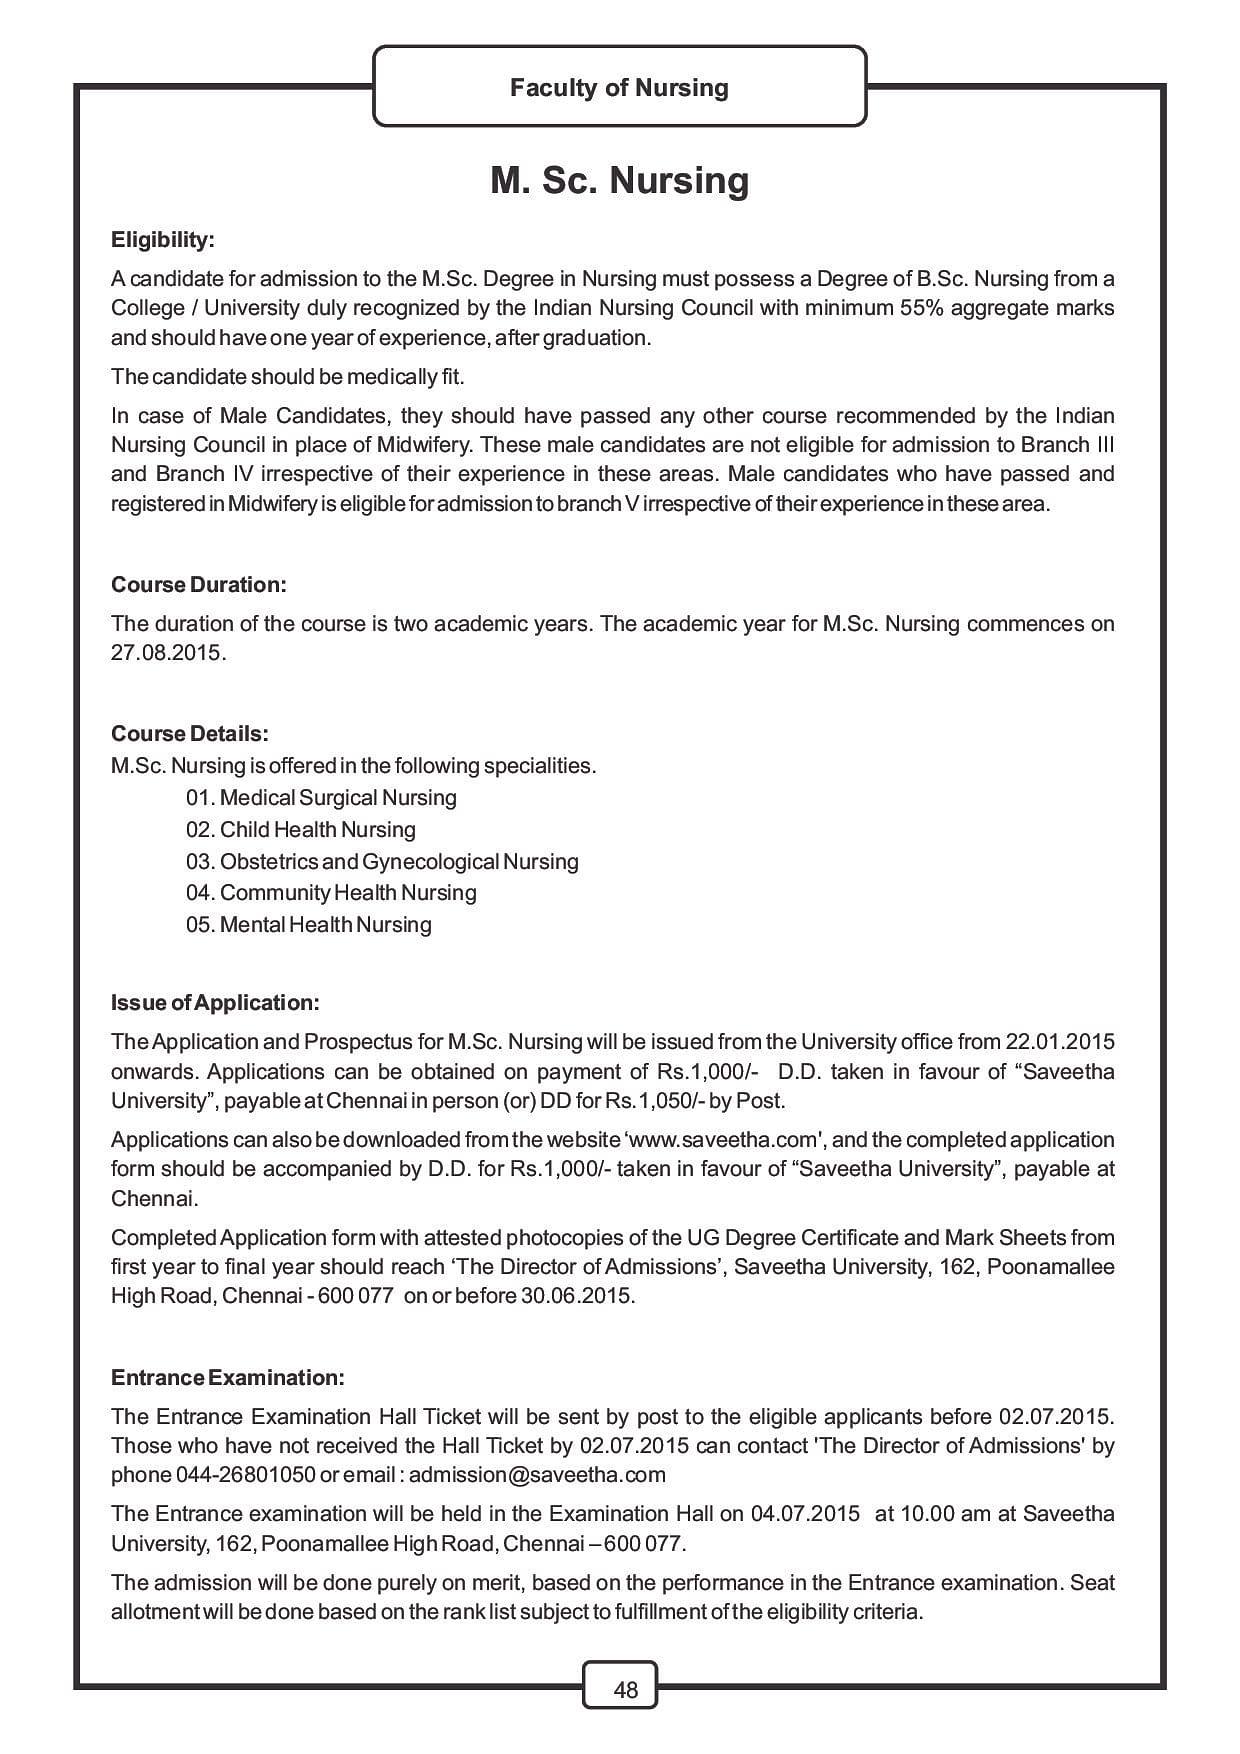 Saveetha university chennai admissions contact website saveetha university chennai college information brochure m nursing image 1 aiddatafo Gallery